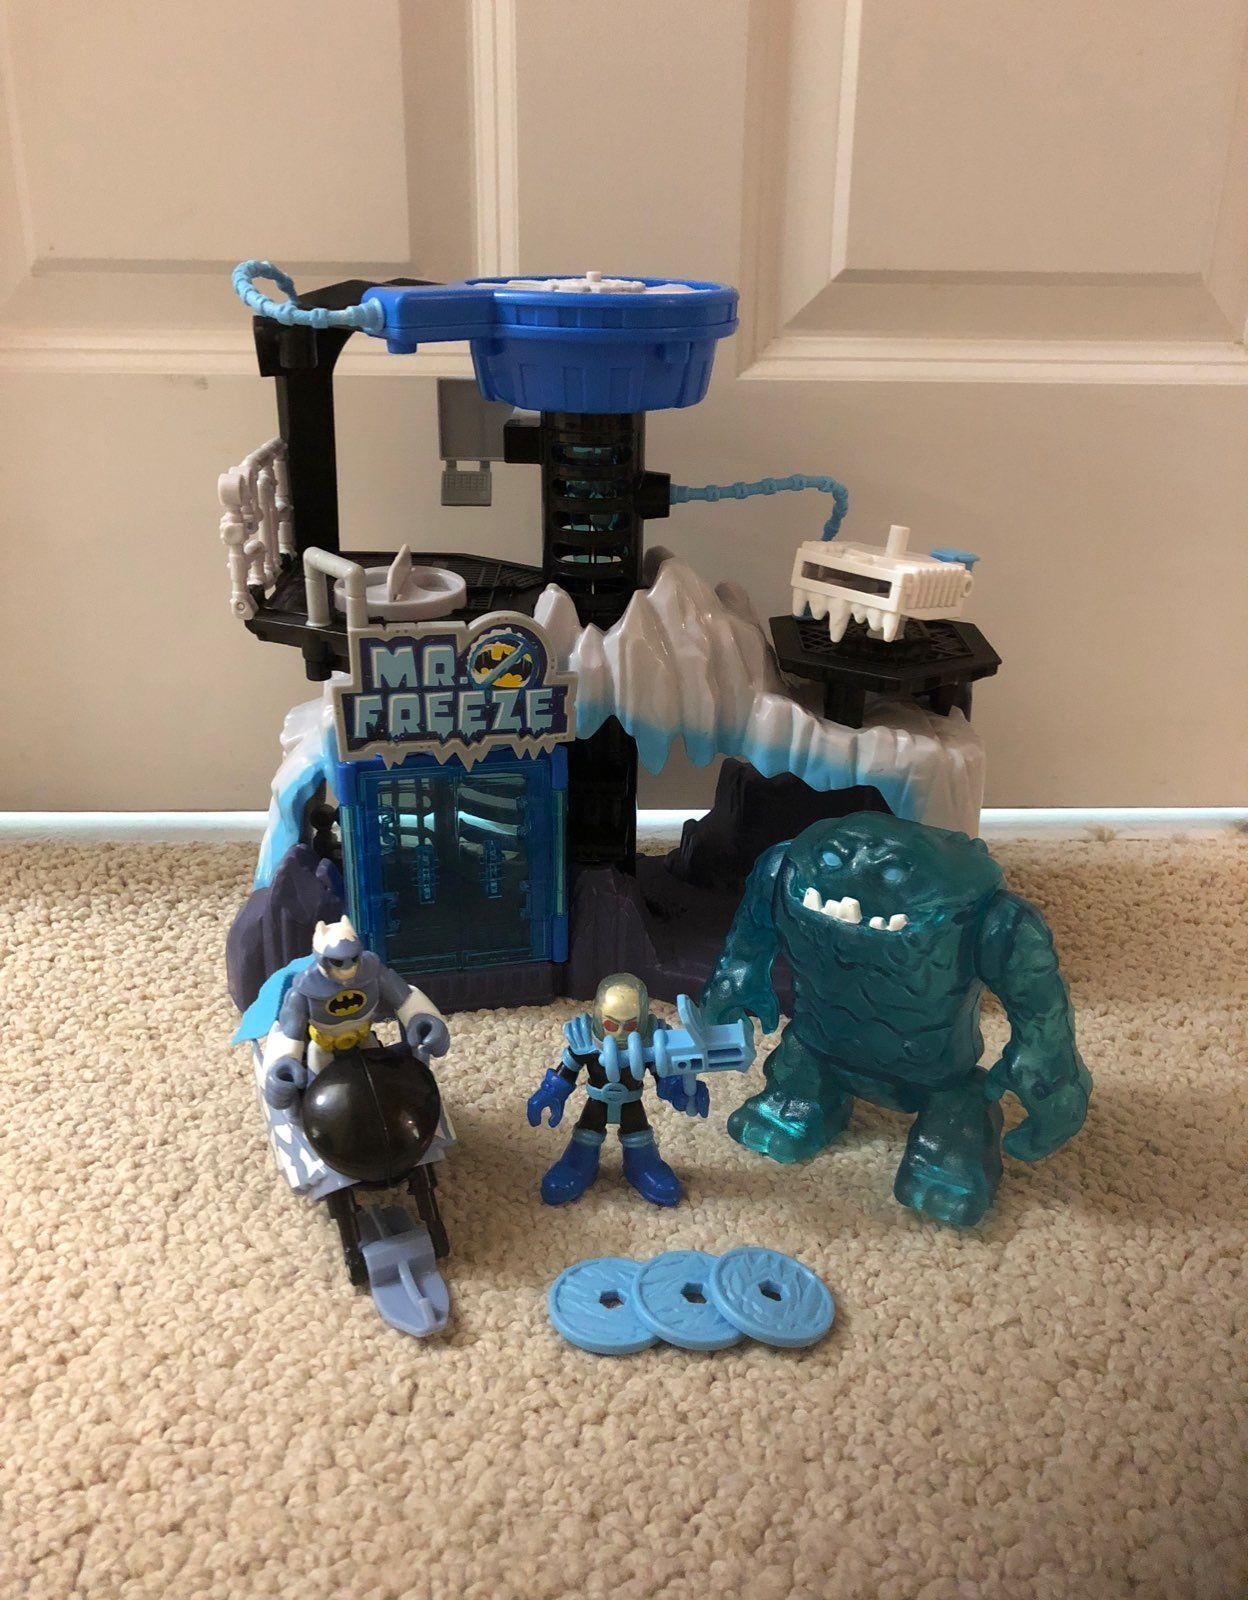 Imaginext Mr. Freeze Gift Set - Mercari: BUY & SELL THINGS YOU LOVE